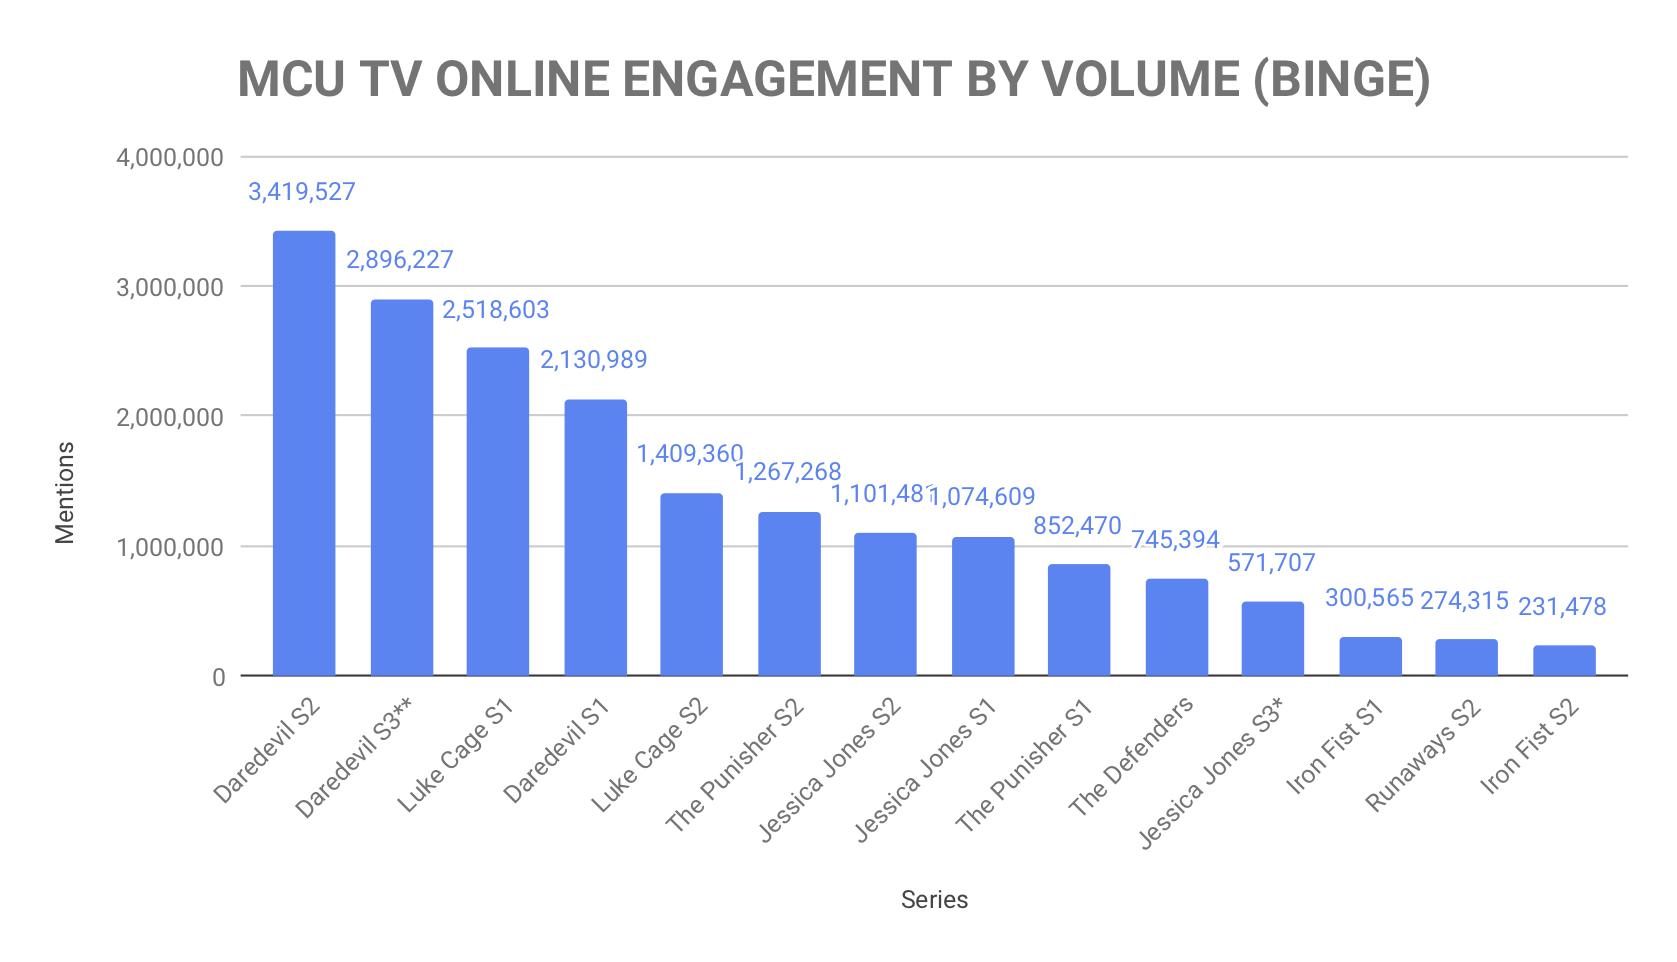 MCU TV ONLINE ENGAGEMENT BY VOLUME (FINAL).jpg